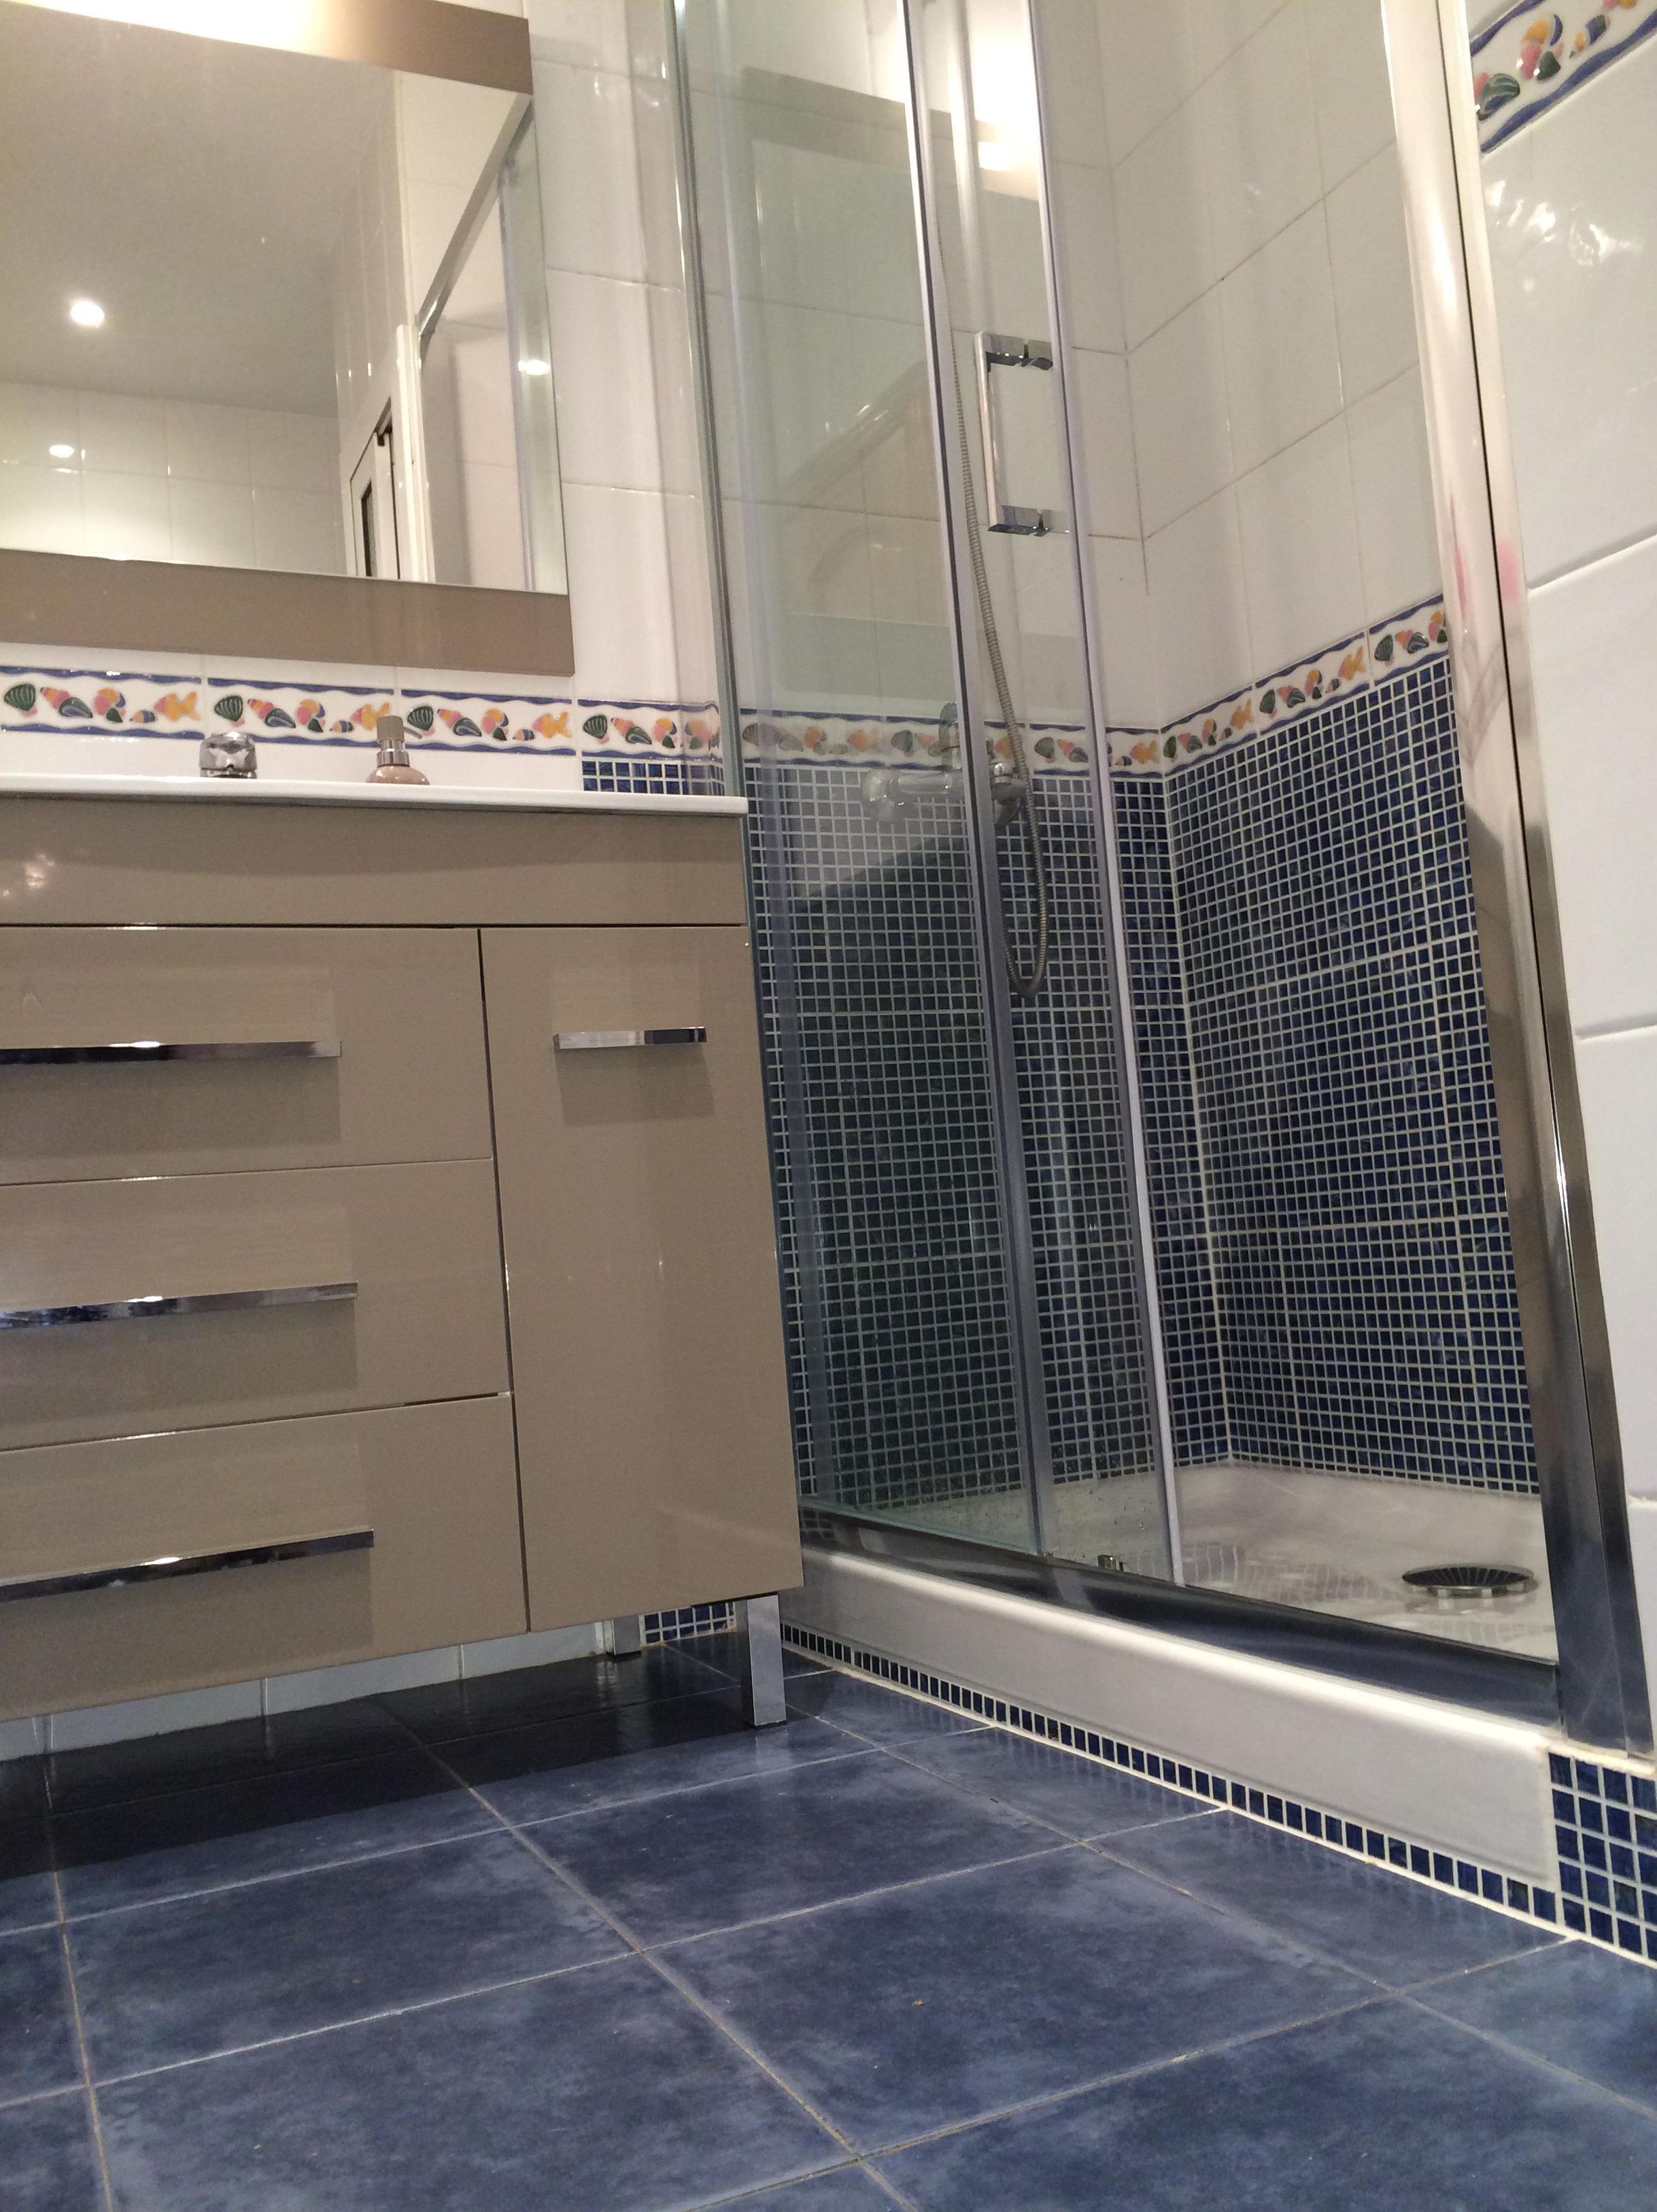 Cambio de bañera por plato de ducha \u002D mueble de baño Torvisco modelo Niger y mampara Torvisco modelo NIZA